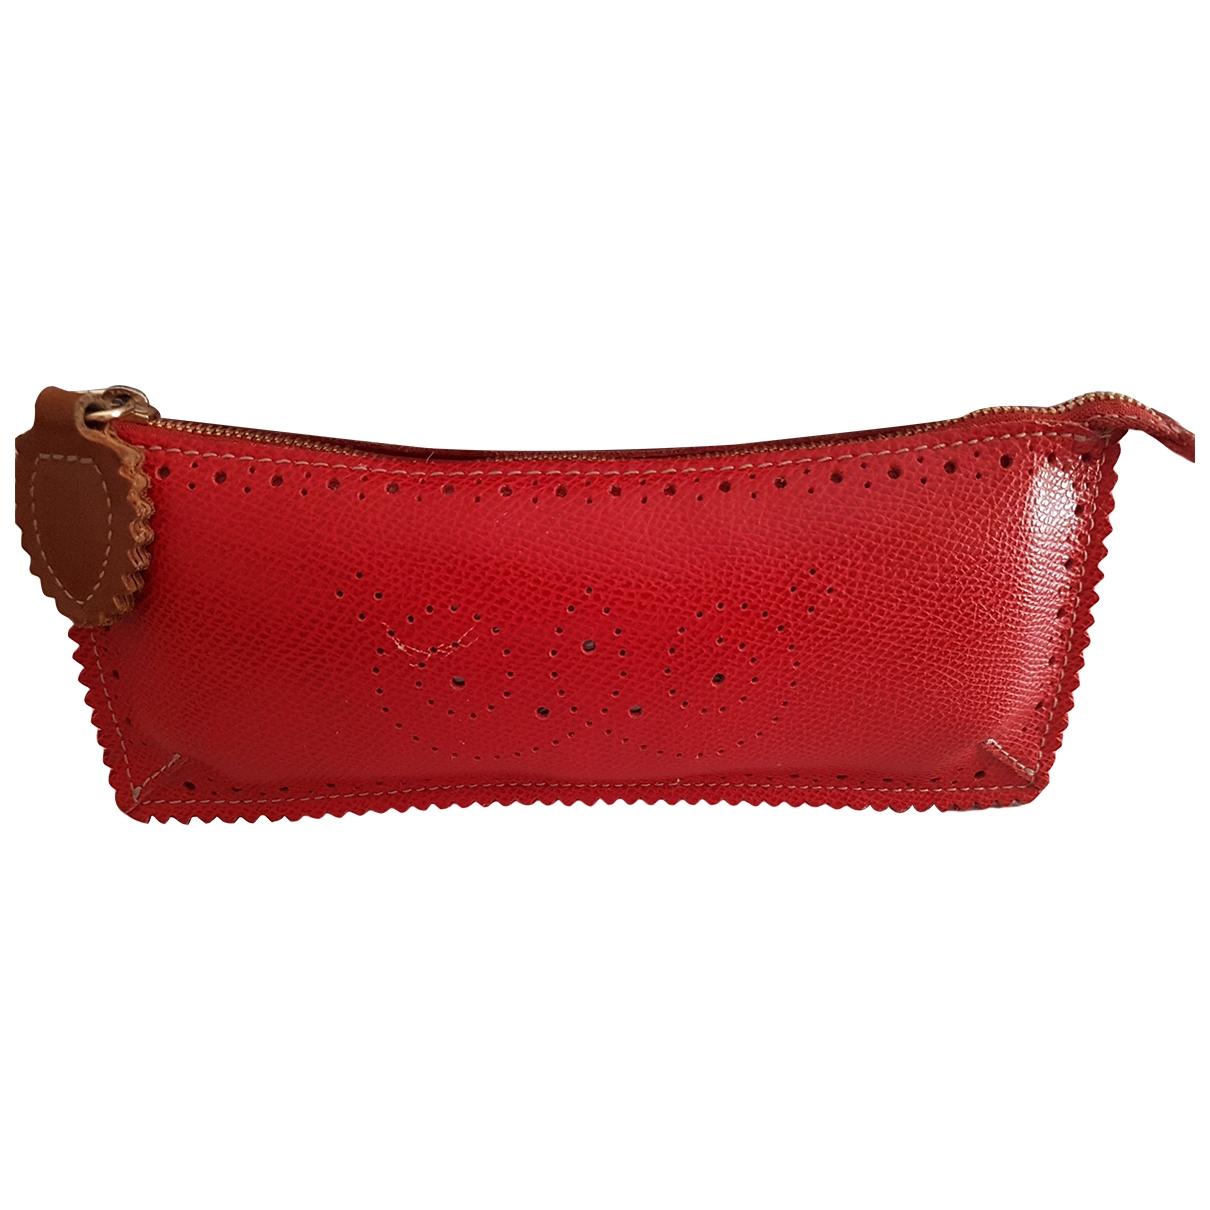 Furla \N Kleinlederwaren in  Rot Leder